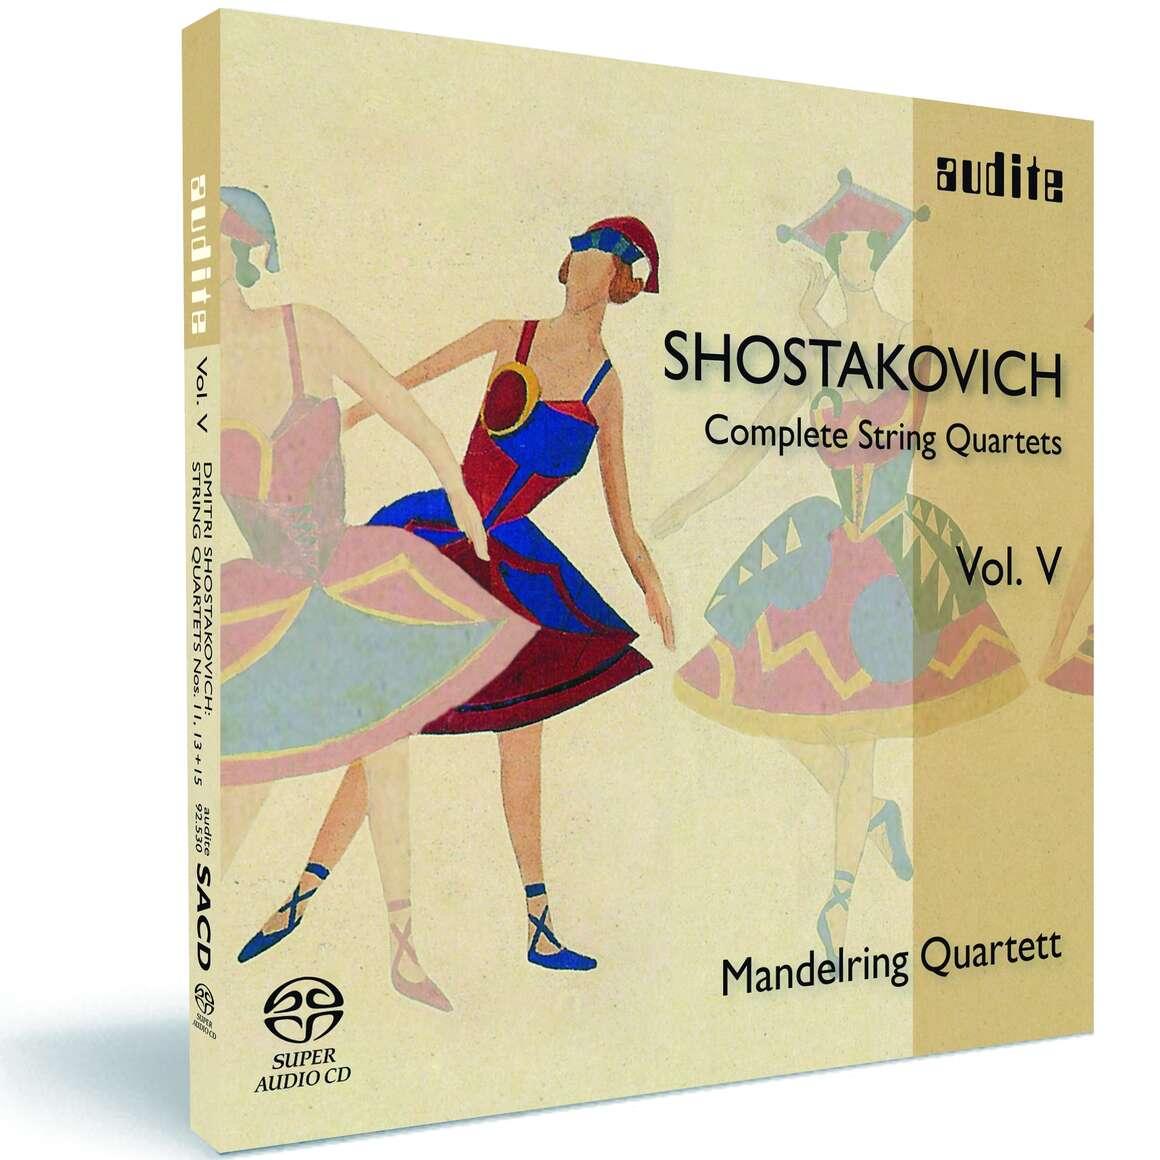 D. Shostakovich: Complete String Quartets Vol. V